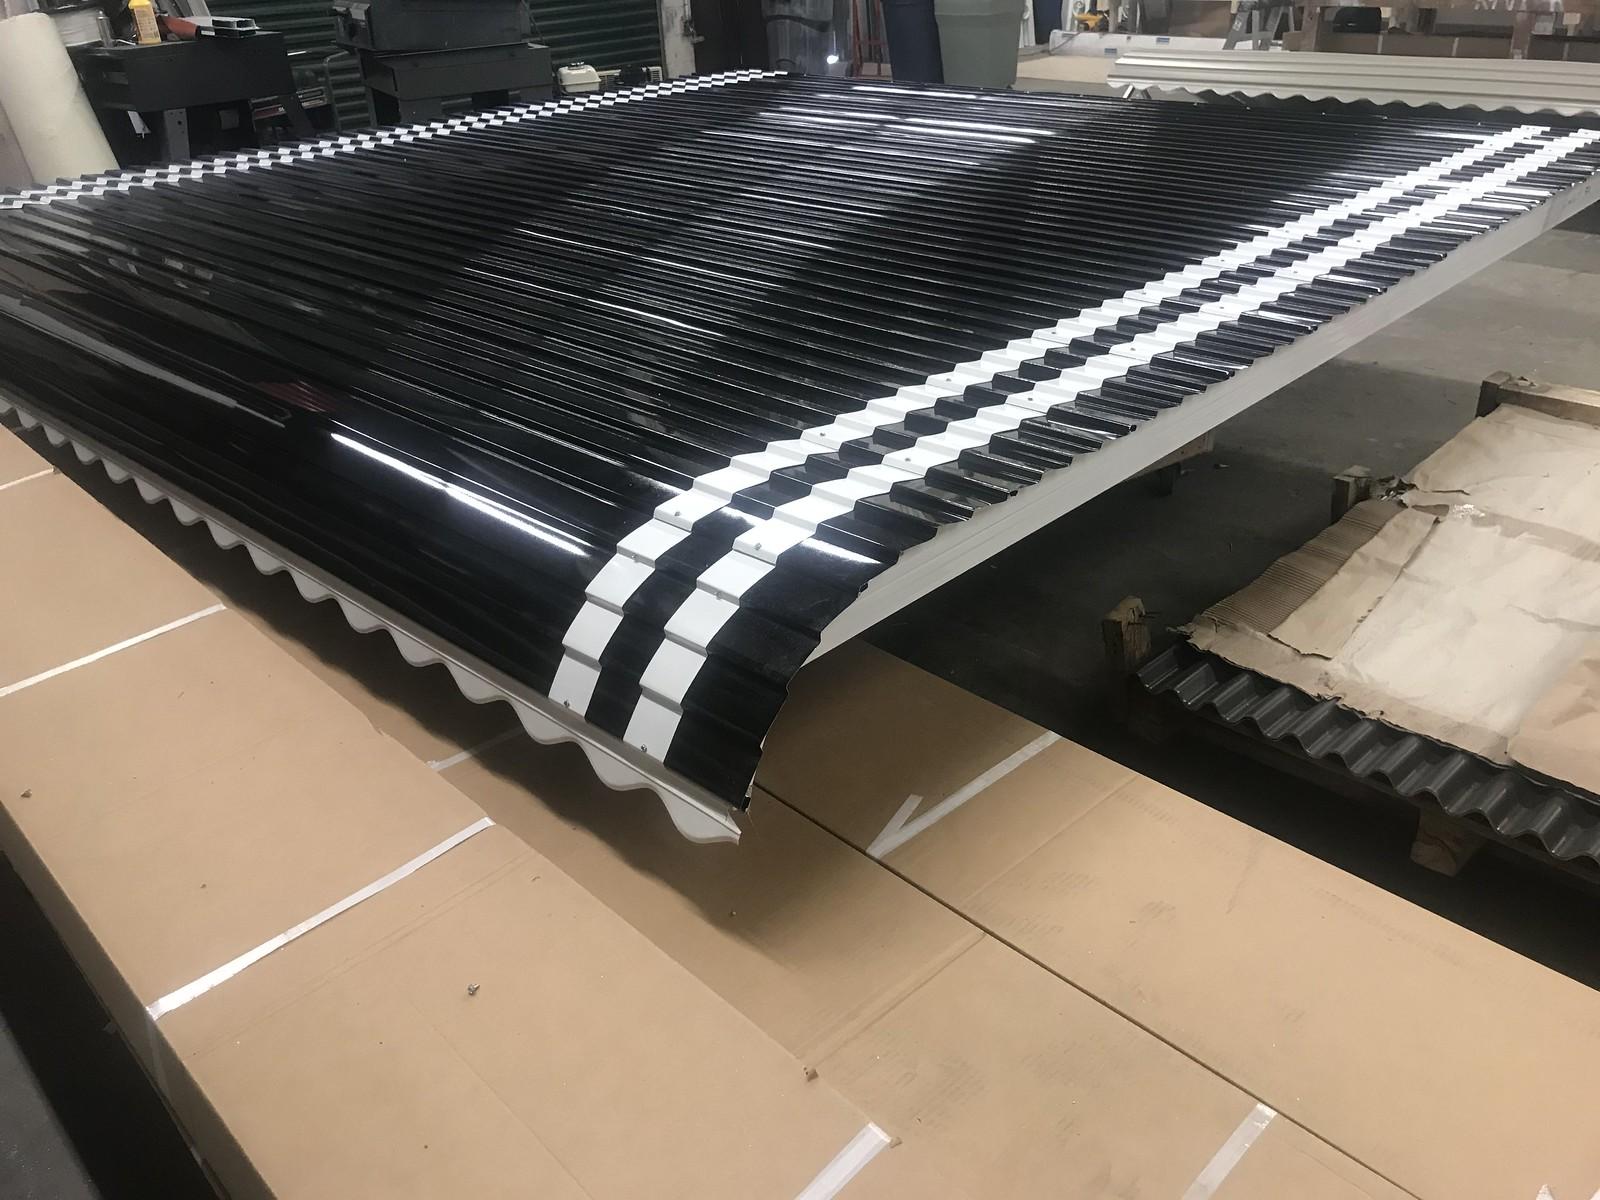 Hoffman manufactured Aluminum Awnings